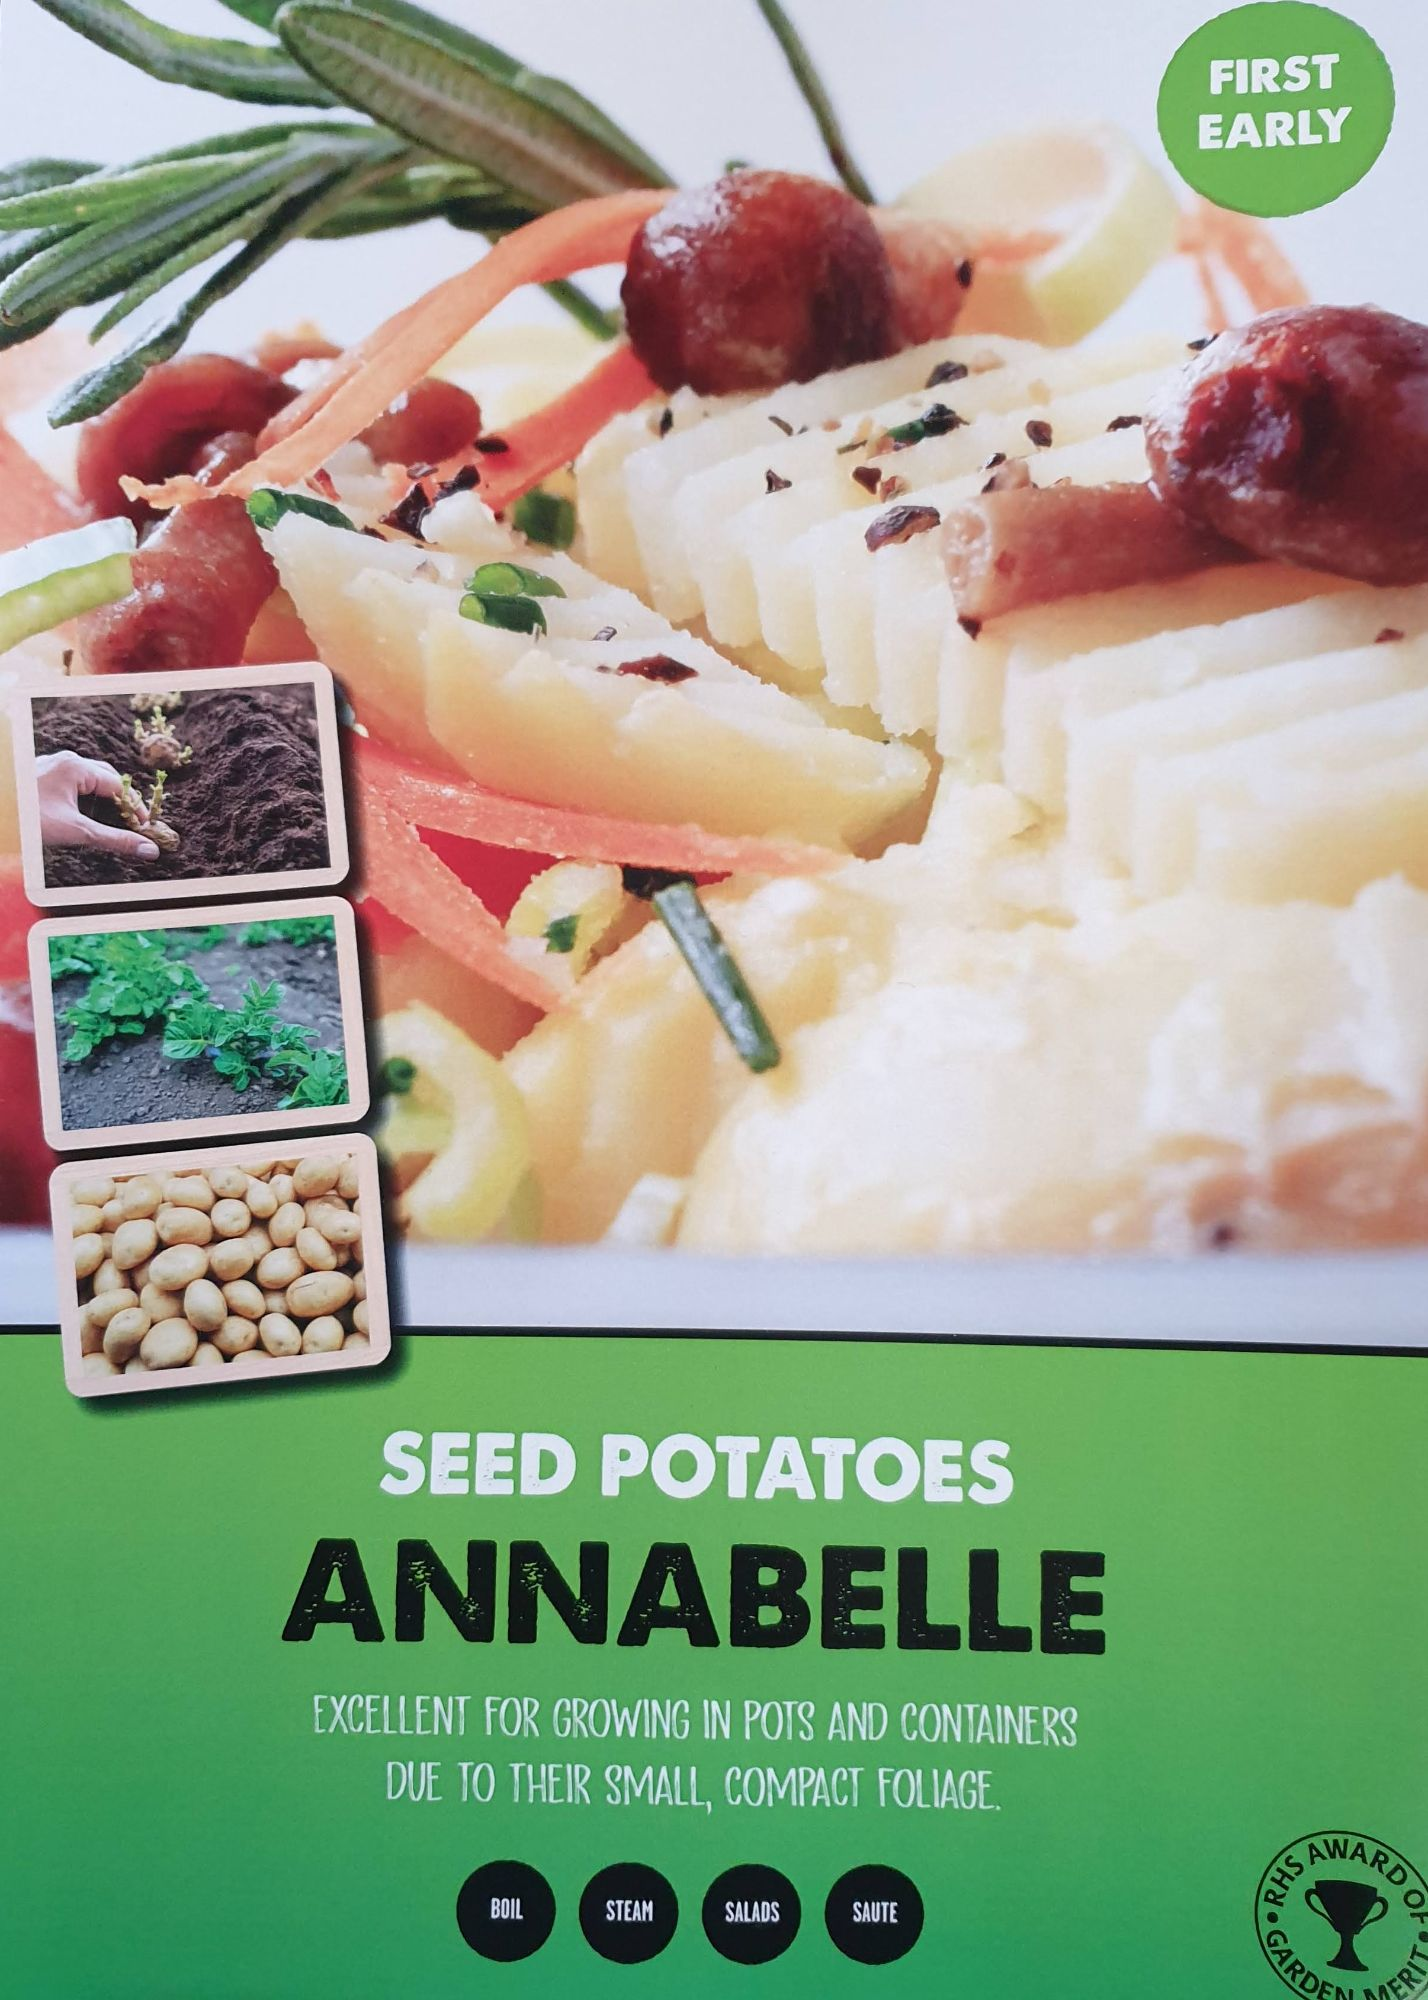 annabelle_seed_potato_info.jpg